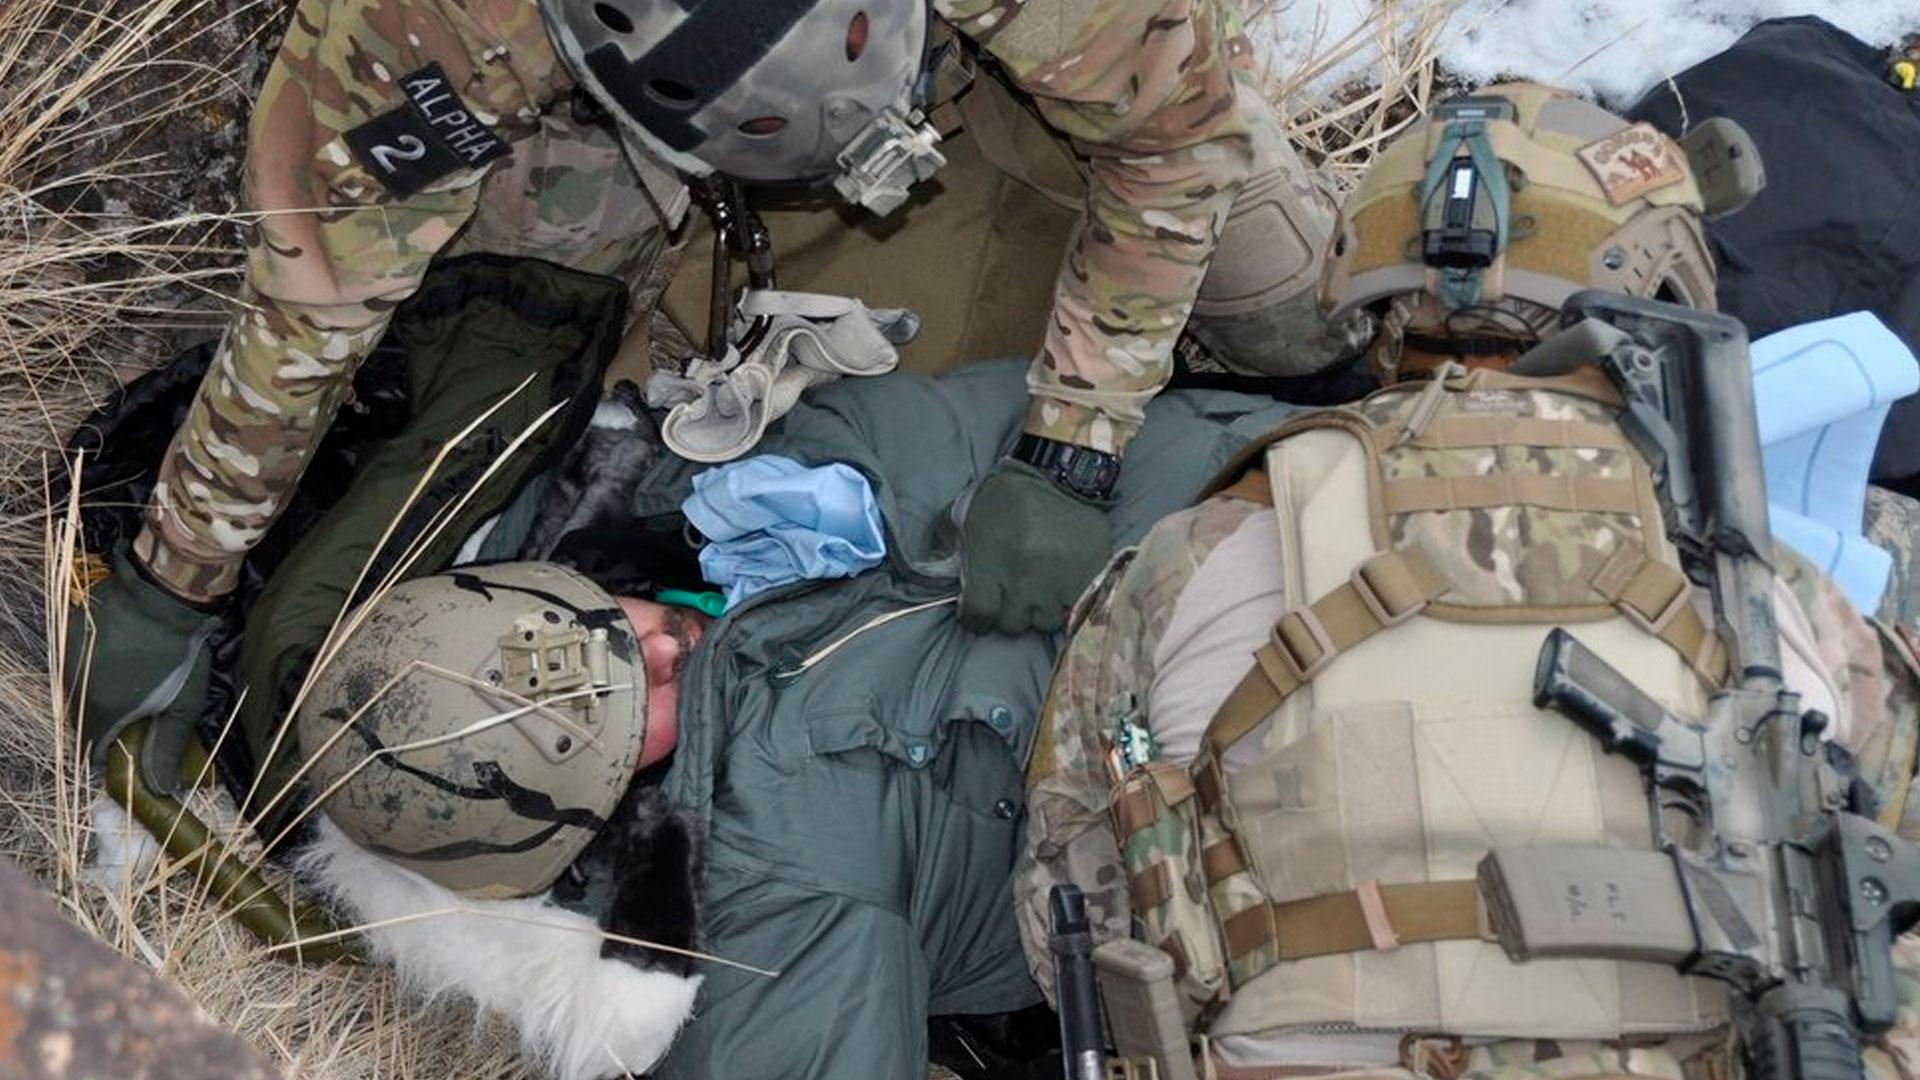 TCCC – Tactical Combat Casualty Care